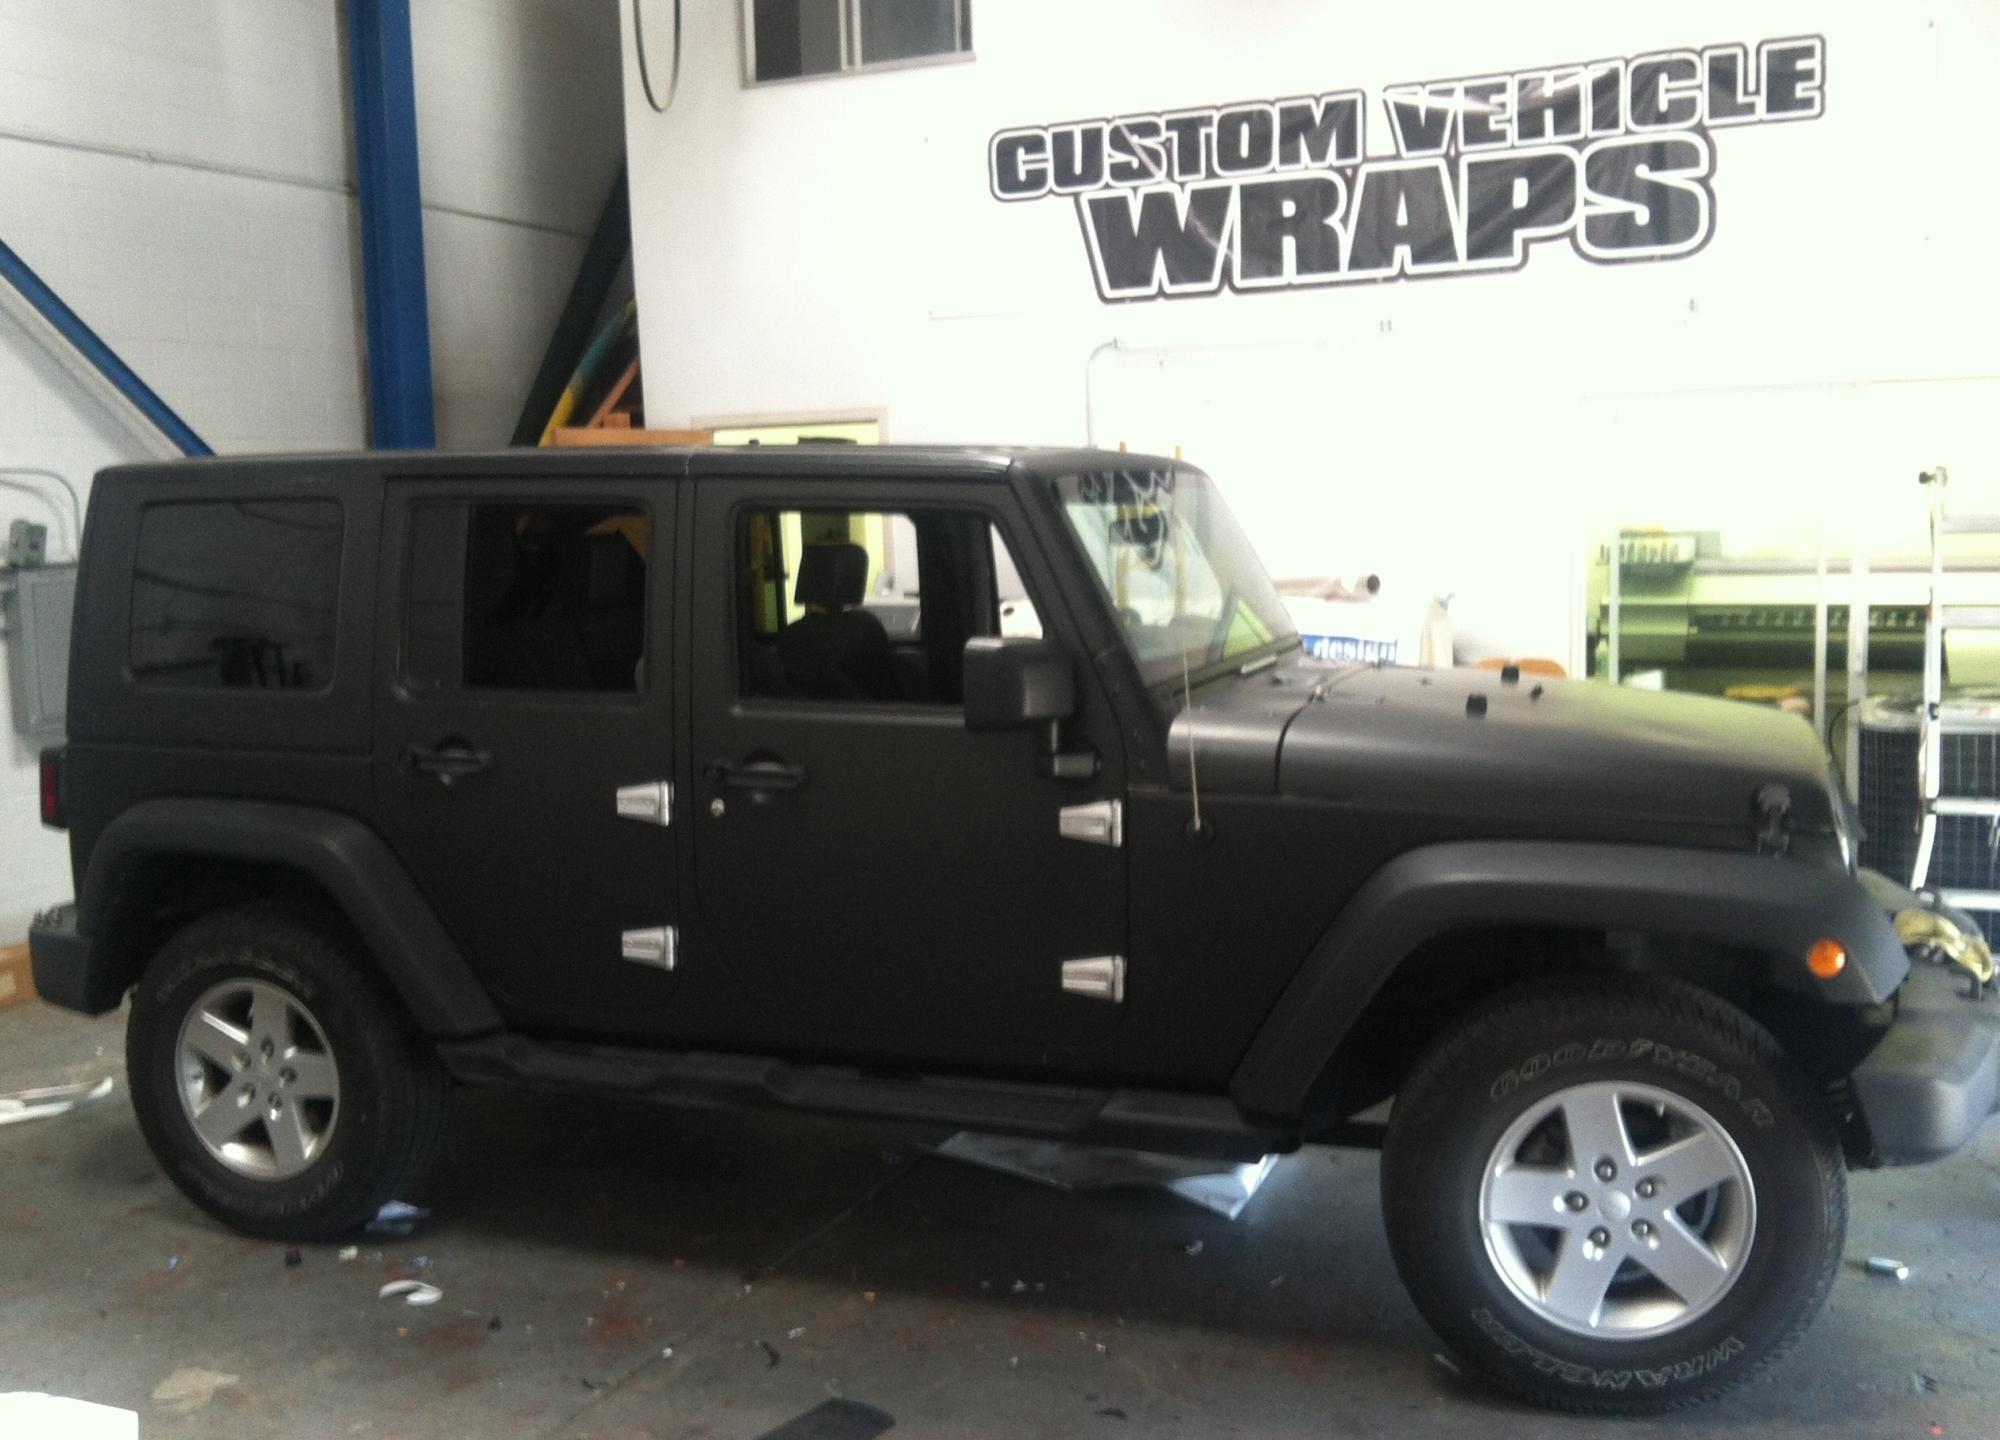 matte black jeep wrap 12 – Custom Vehicle Wraps